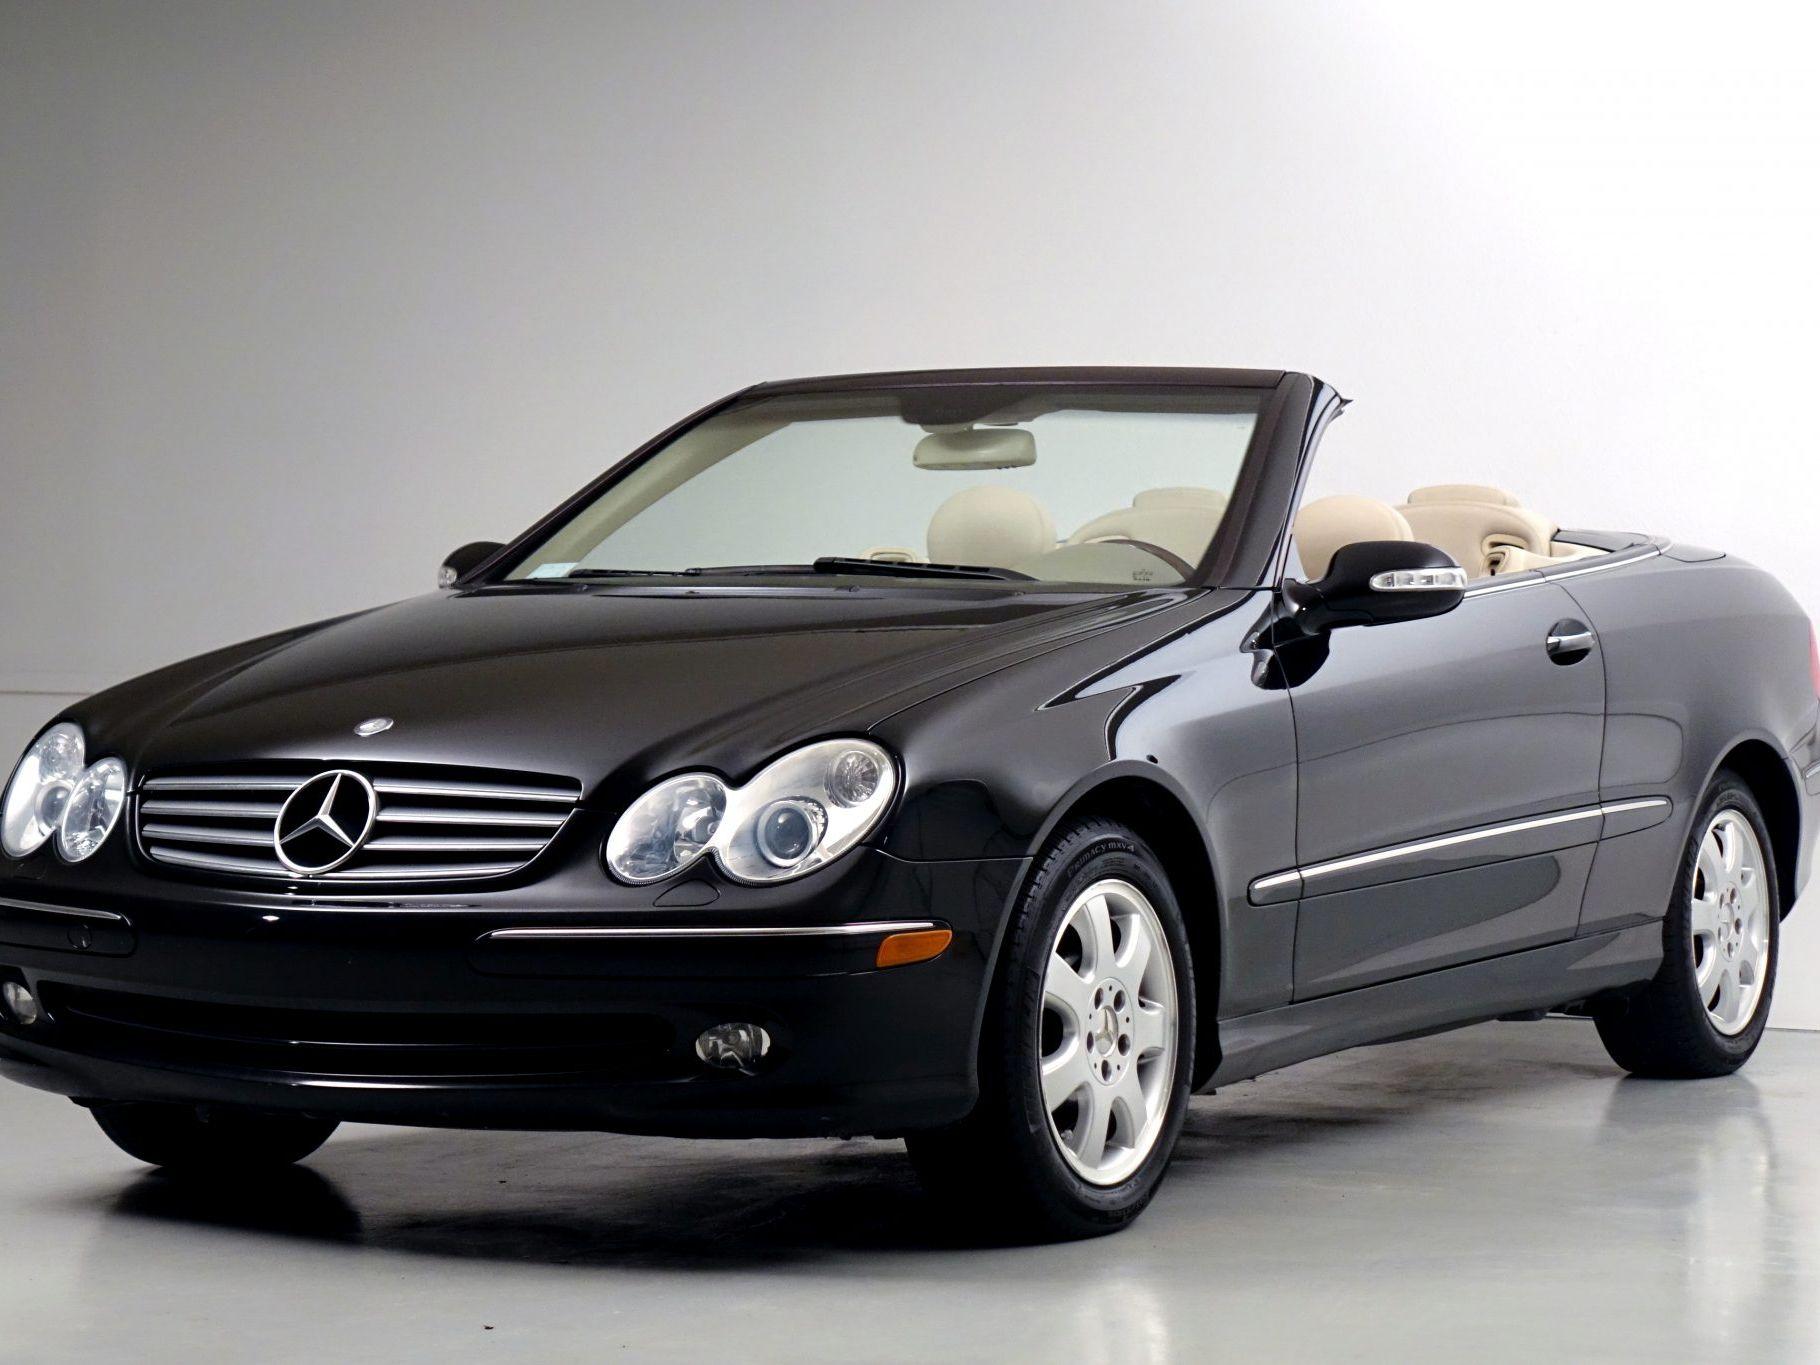 2005 Mercedes-Benz CLK320 Convertible